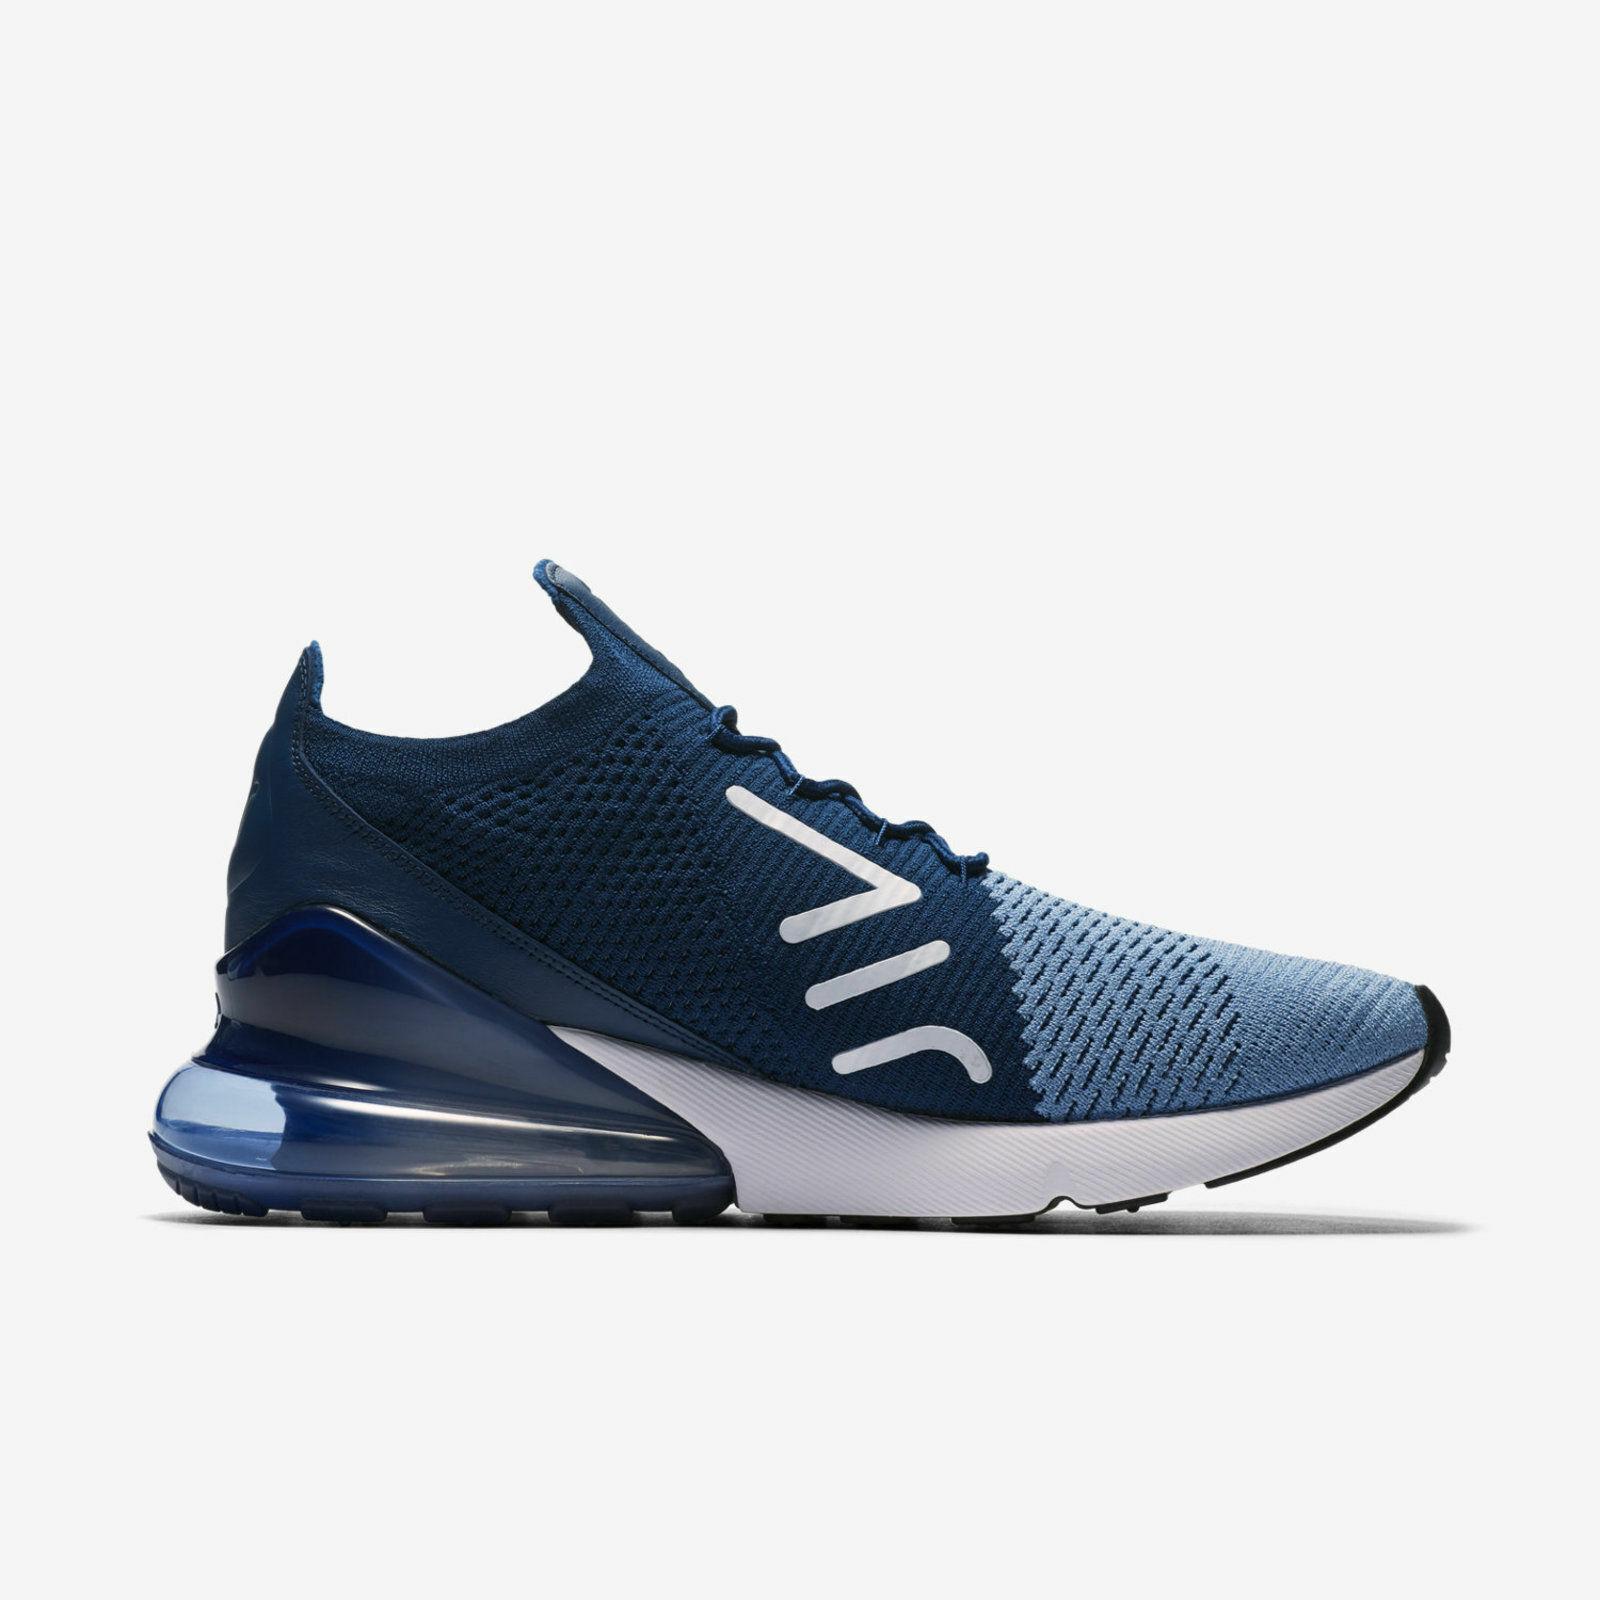 Max Air Nike 270 400 AO1023 White bluee Work shoes Men's